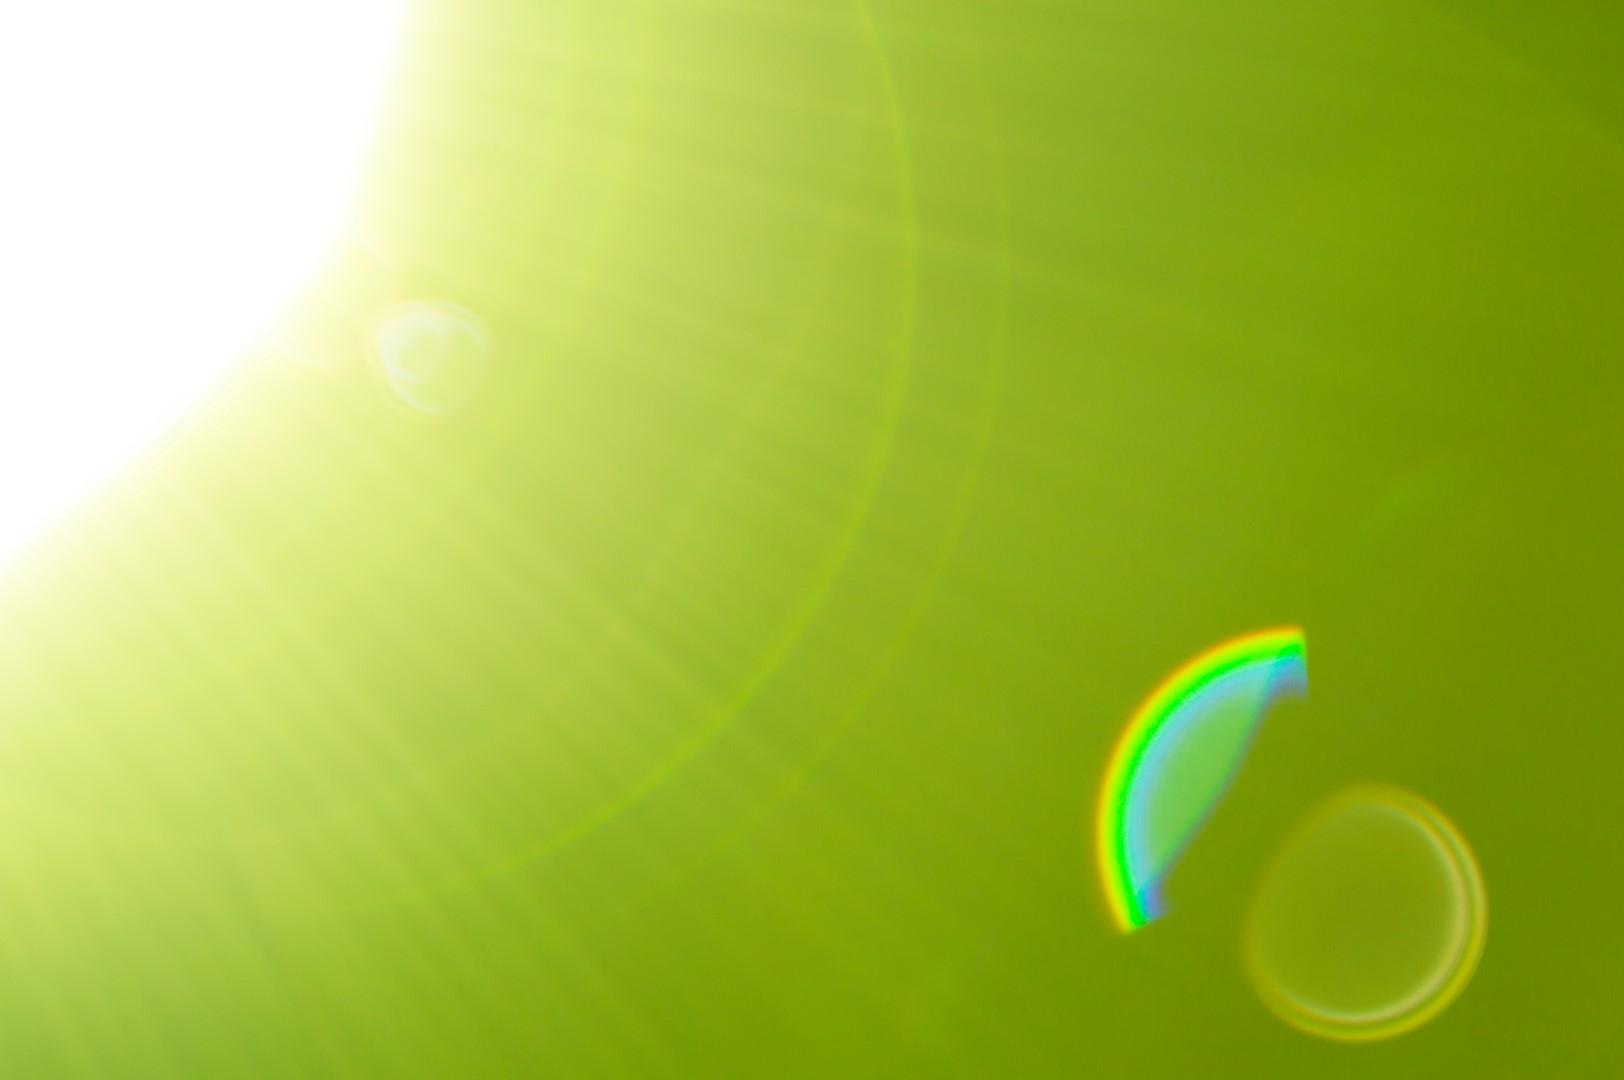 FLORIDA POWER & LIGHT – SOLAR LEADER OR SOLAR LAGGARD?